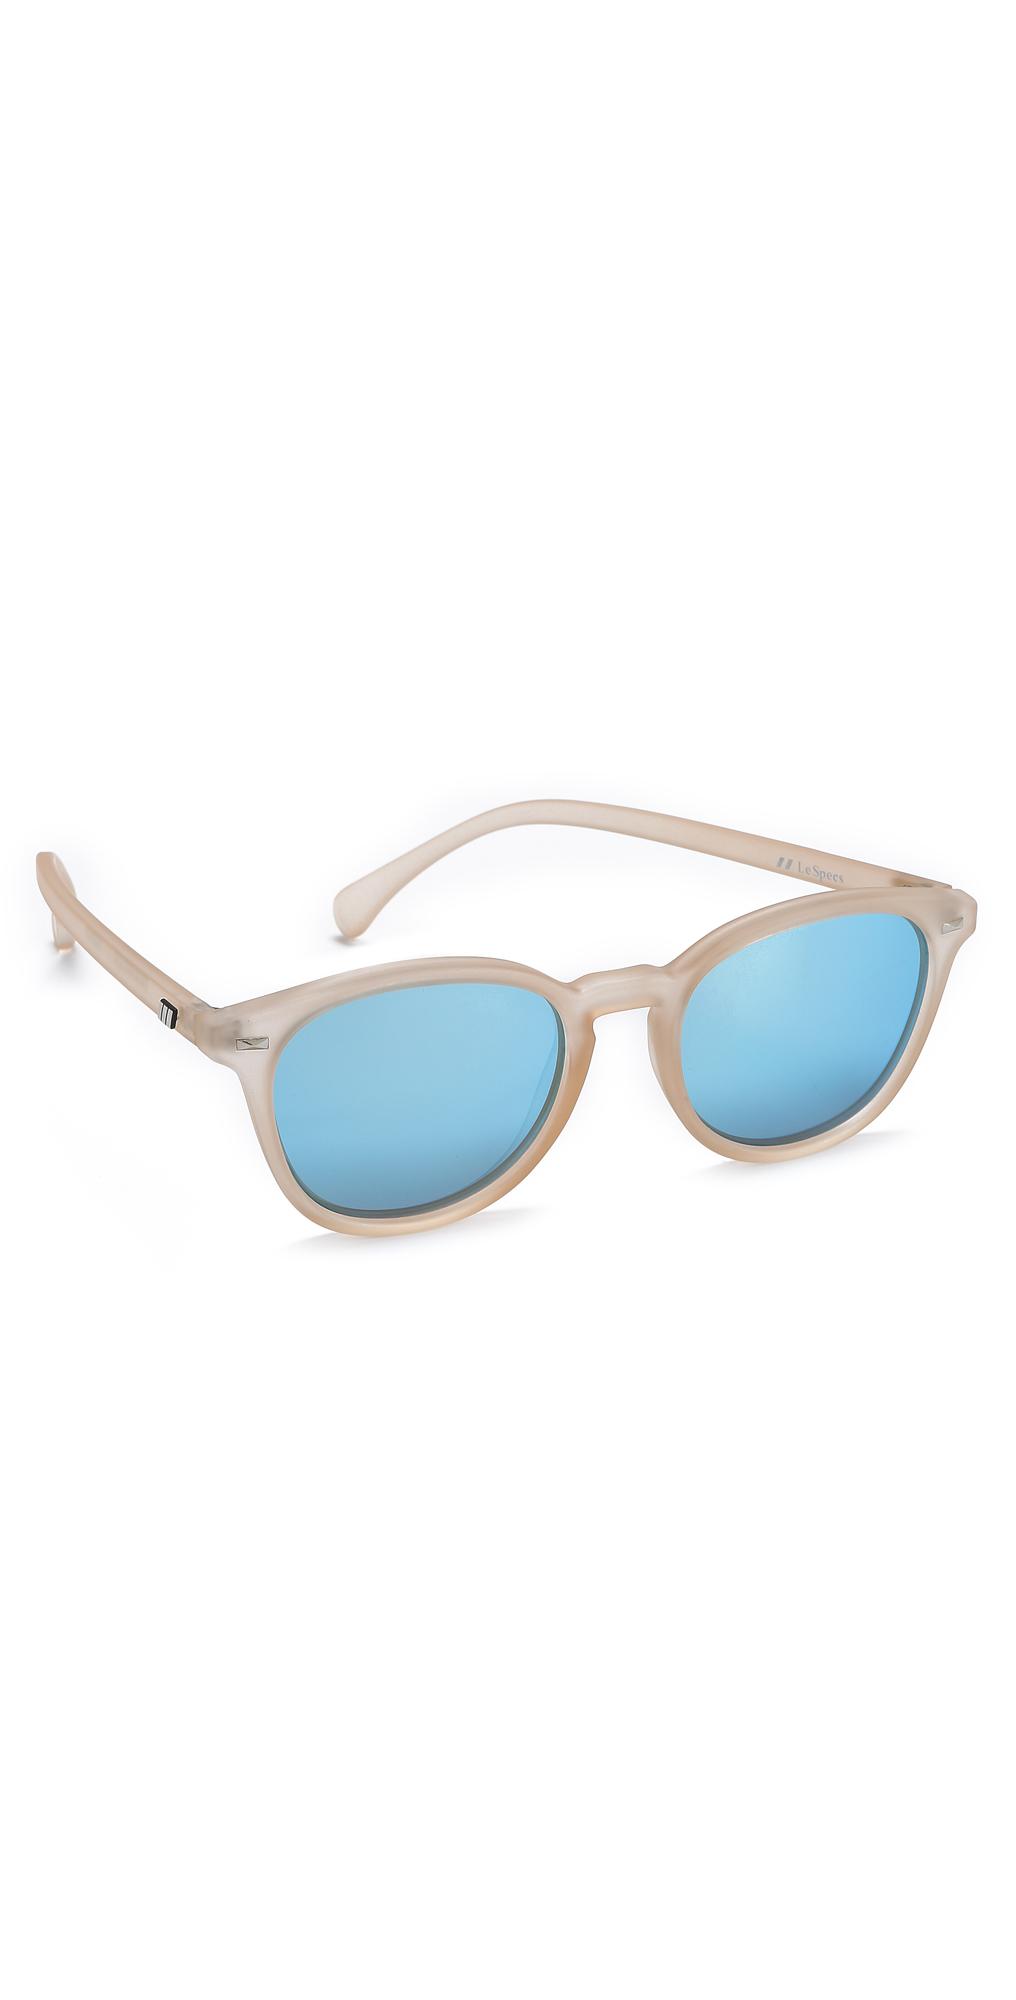 Bandwagon Sunglasses Le Specs